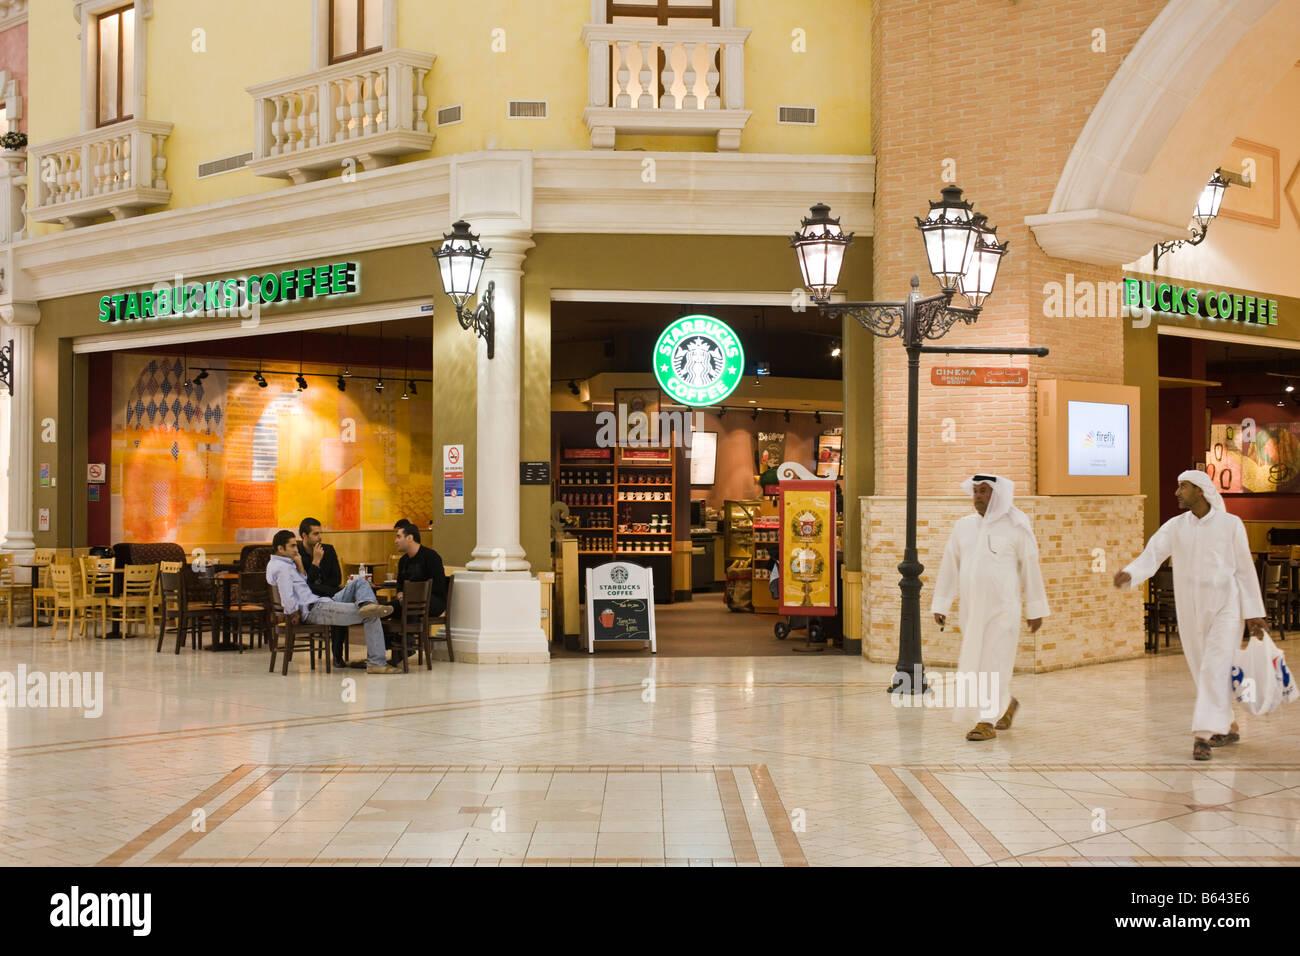 Starbucks, Villagio Mall, Doha, Qatar - Stock Image